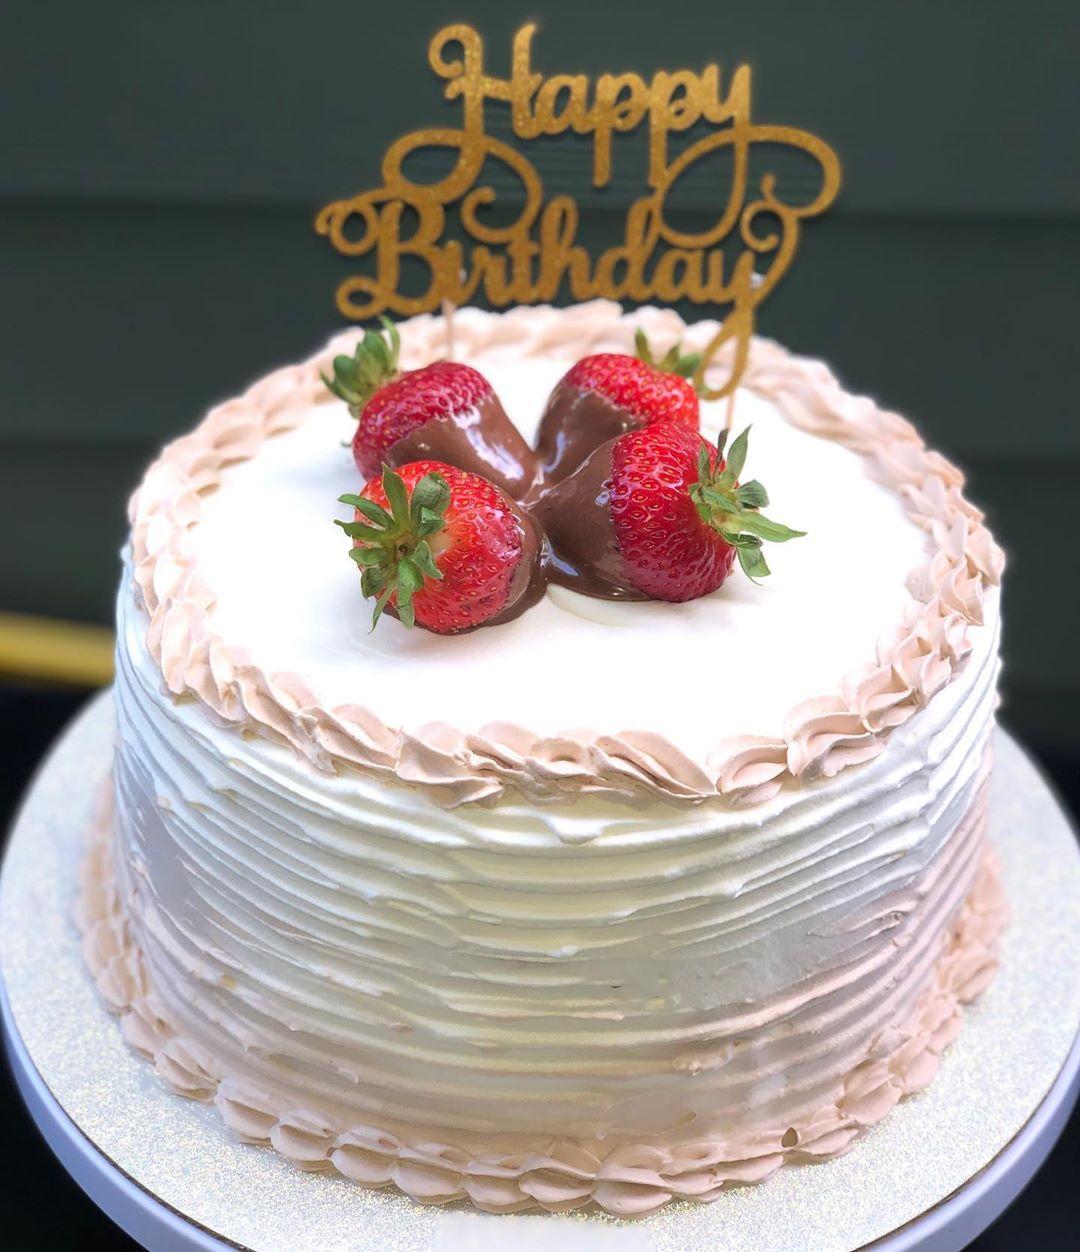 Happy Birthday Robert I Hope You Like Your Cake Banana Bread Cake With Fresh Banana Filling And Strawberries And With Choc Banana Bread Cake Cake Bread Cake